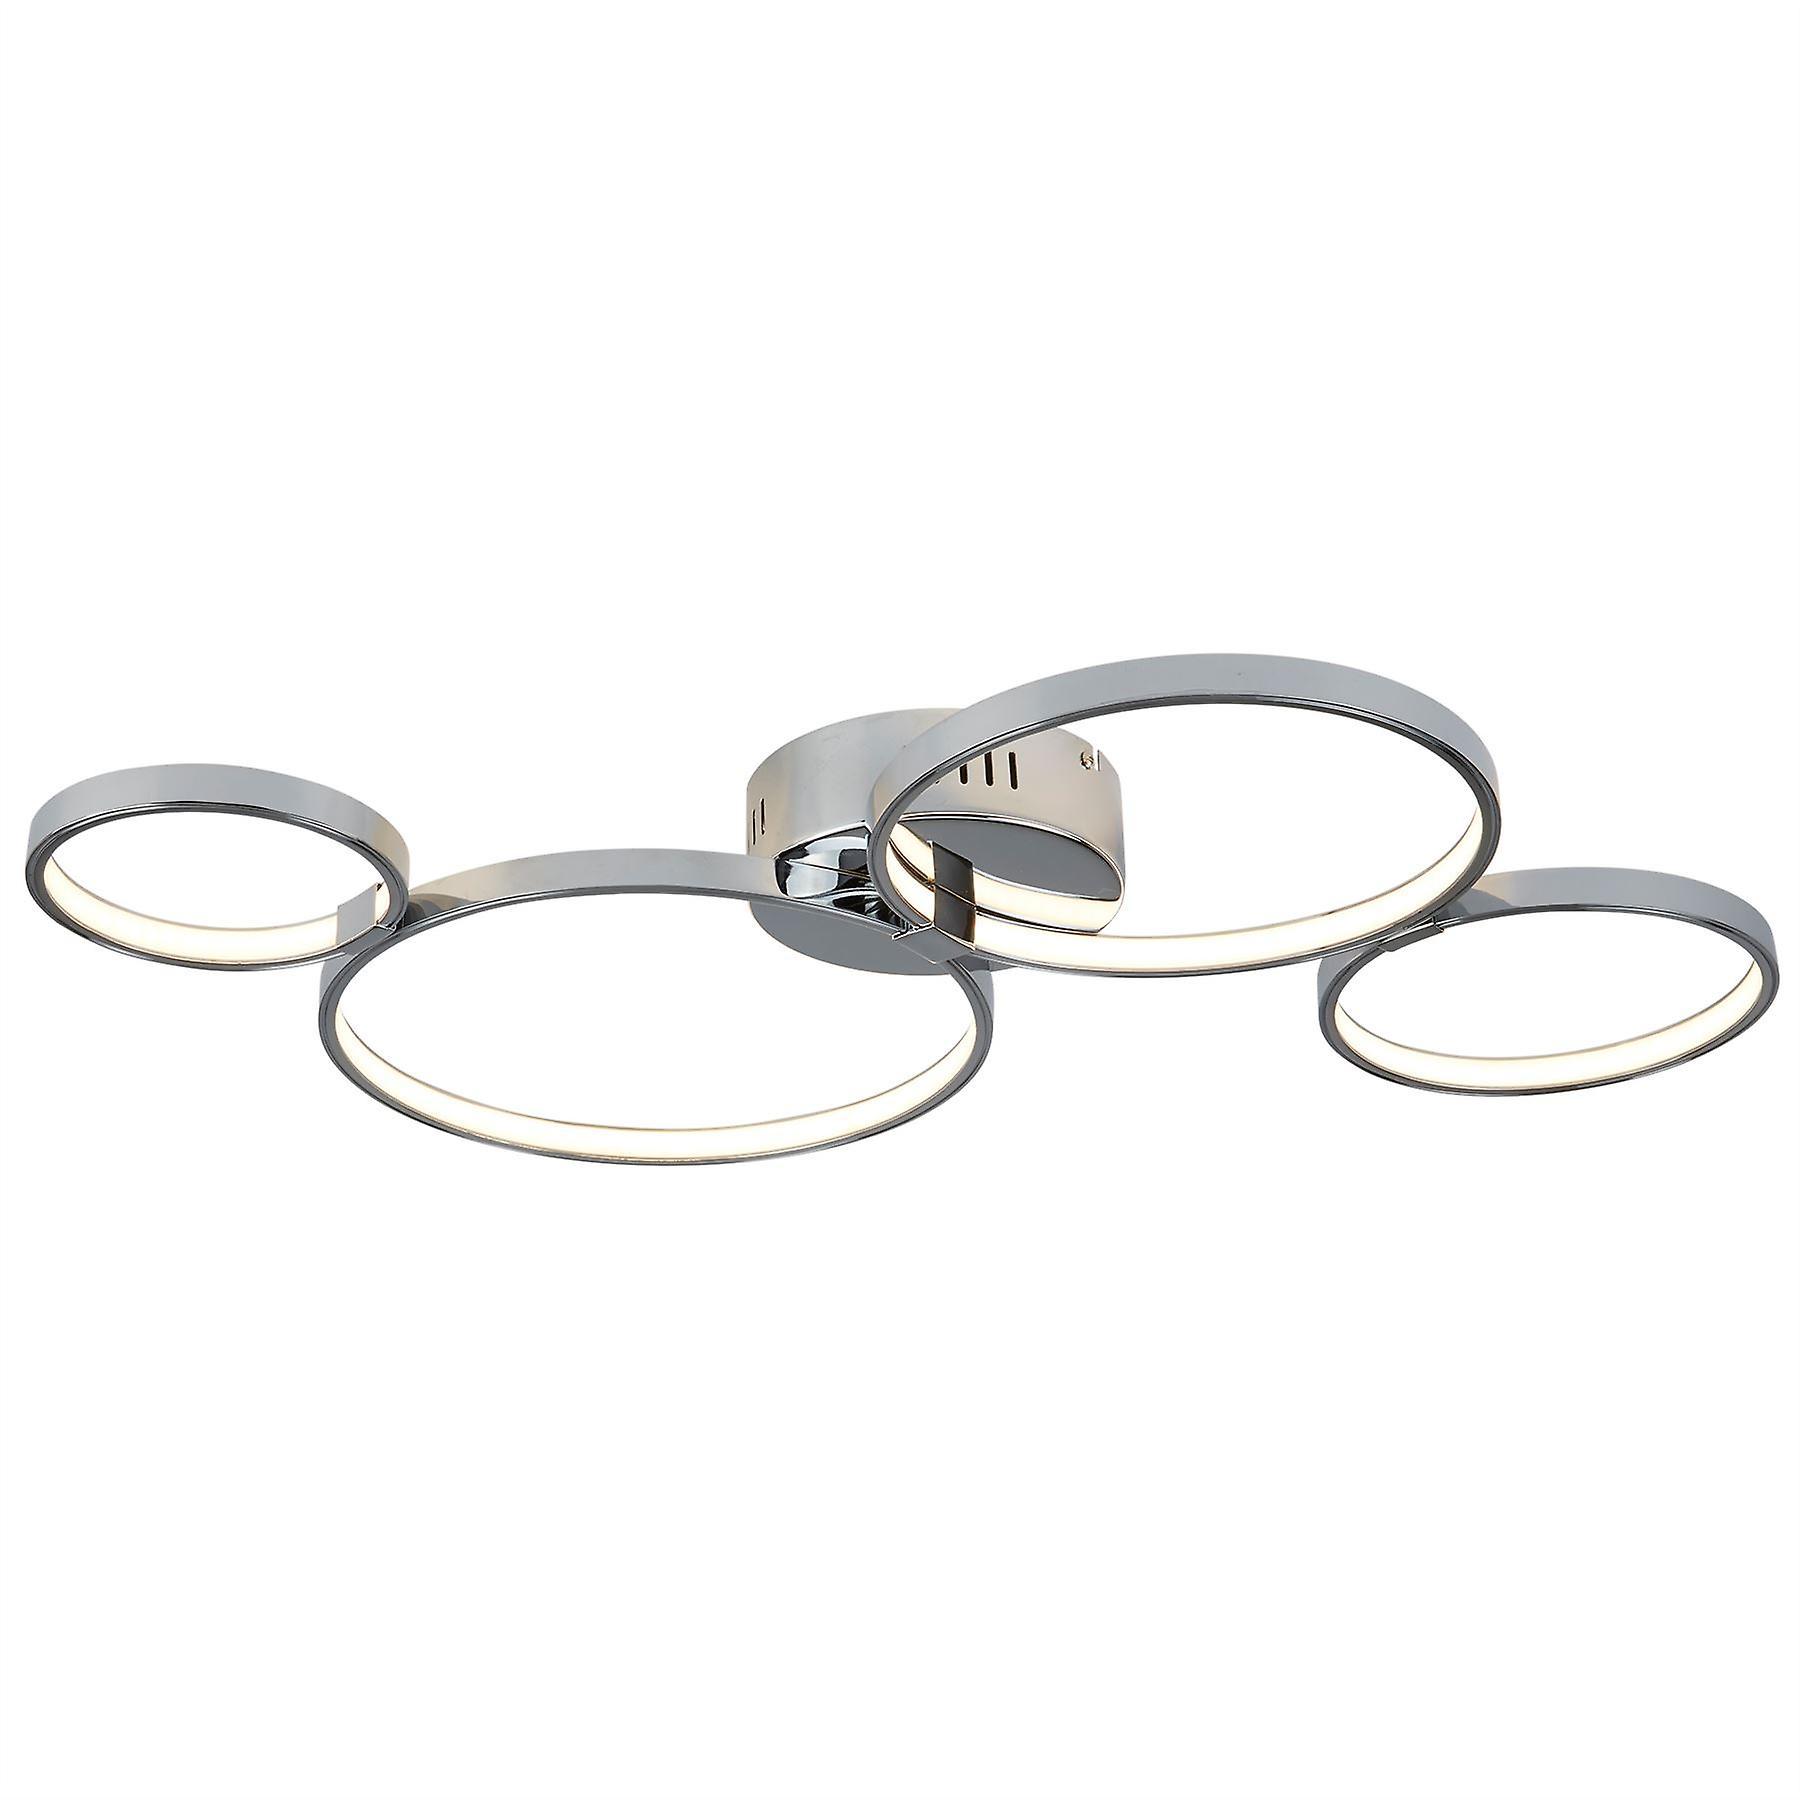 Solexa Chrome Four lumière LED Flush Fitting - Searchlumière 2004-4CC